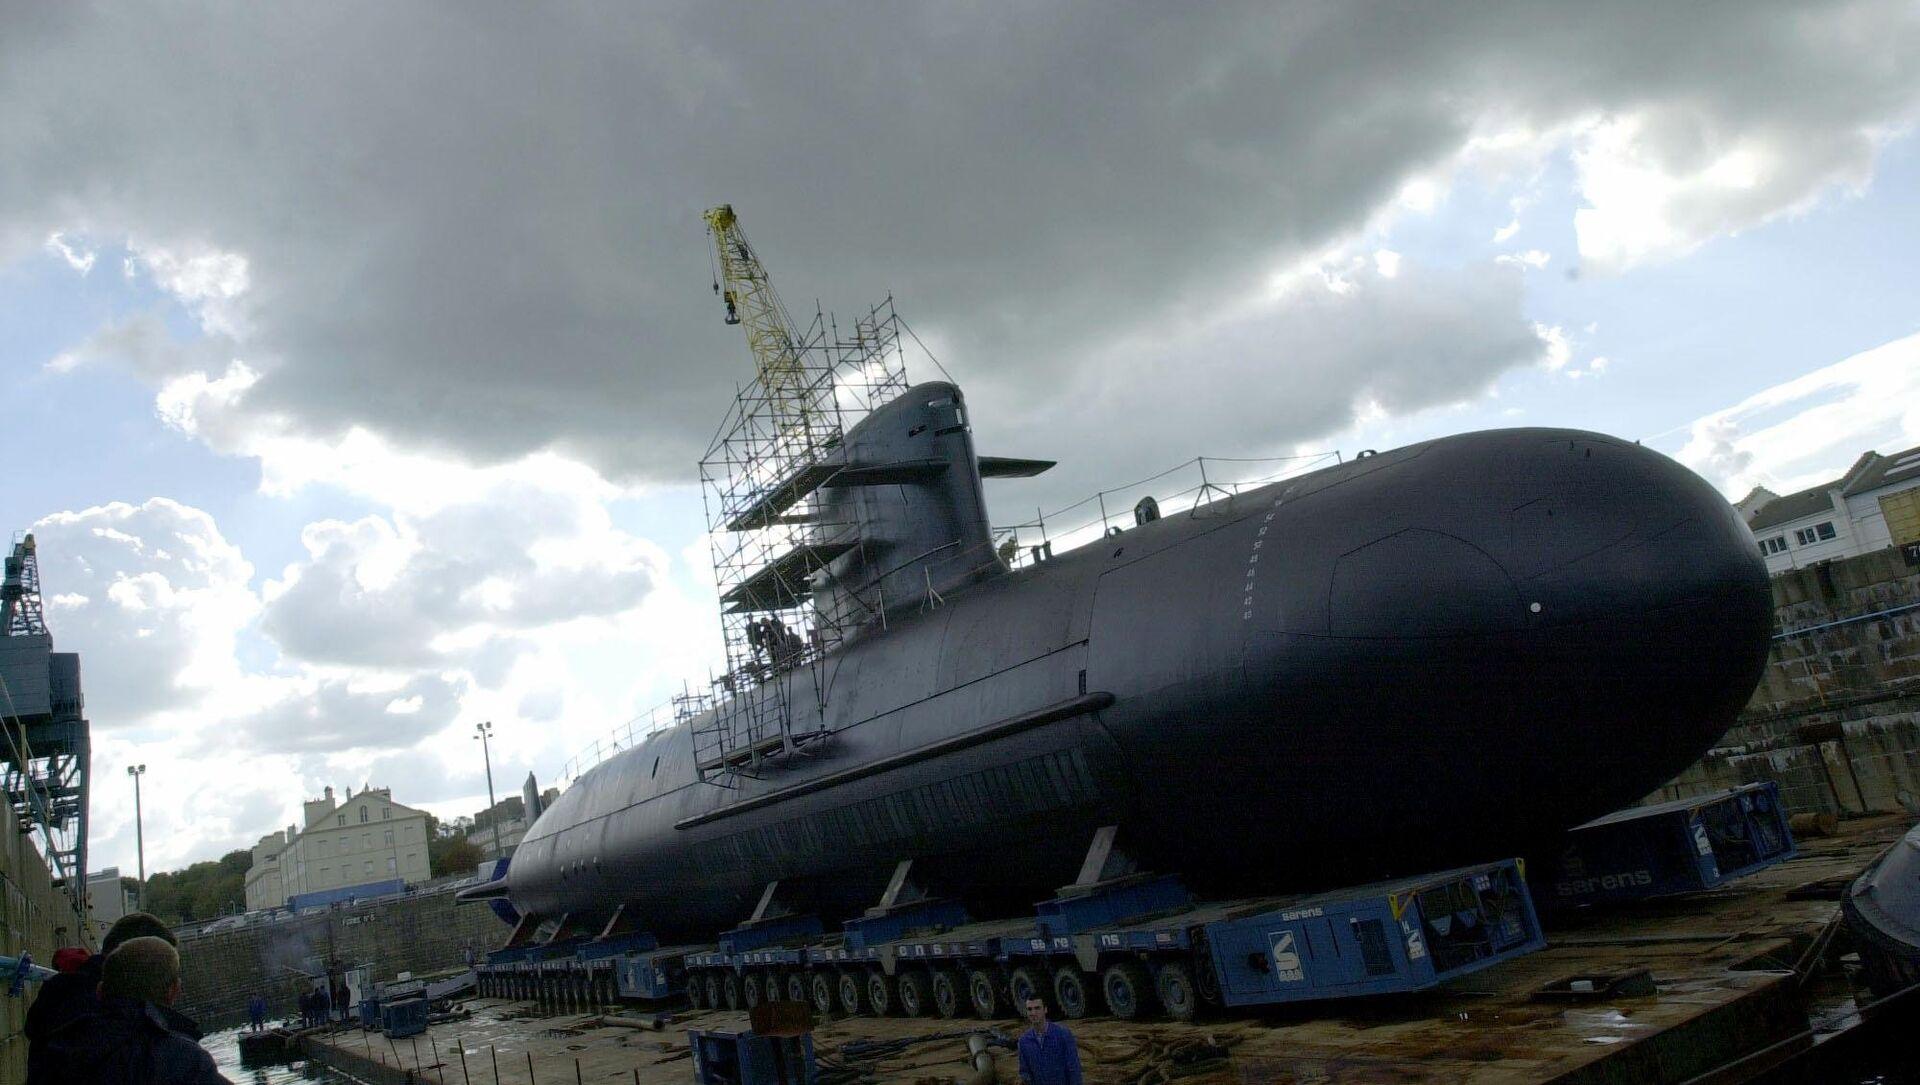 sous-marins Scorpène - Sputnik France, 1920, 19.09.2021